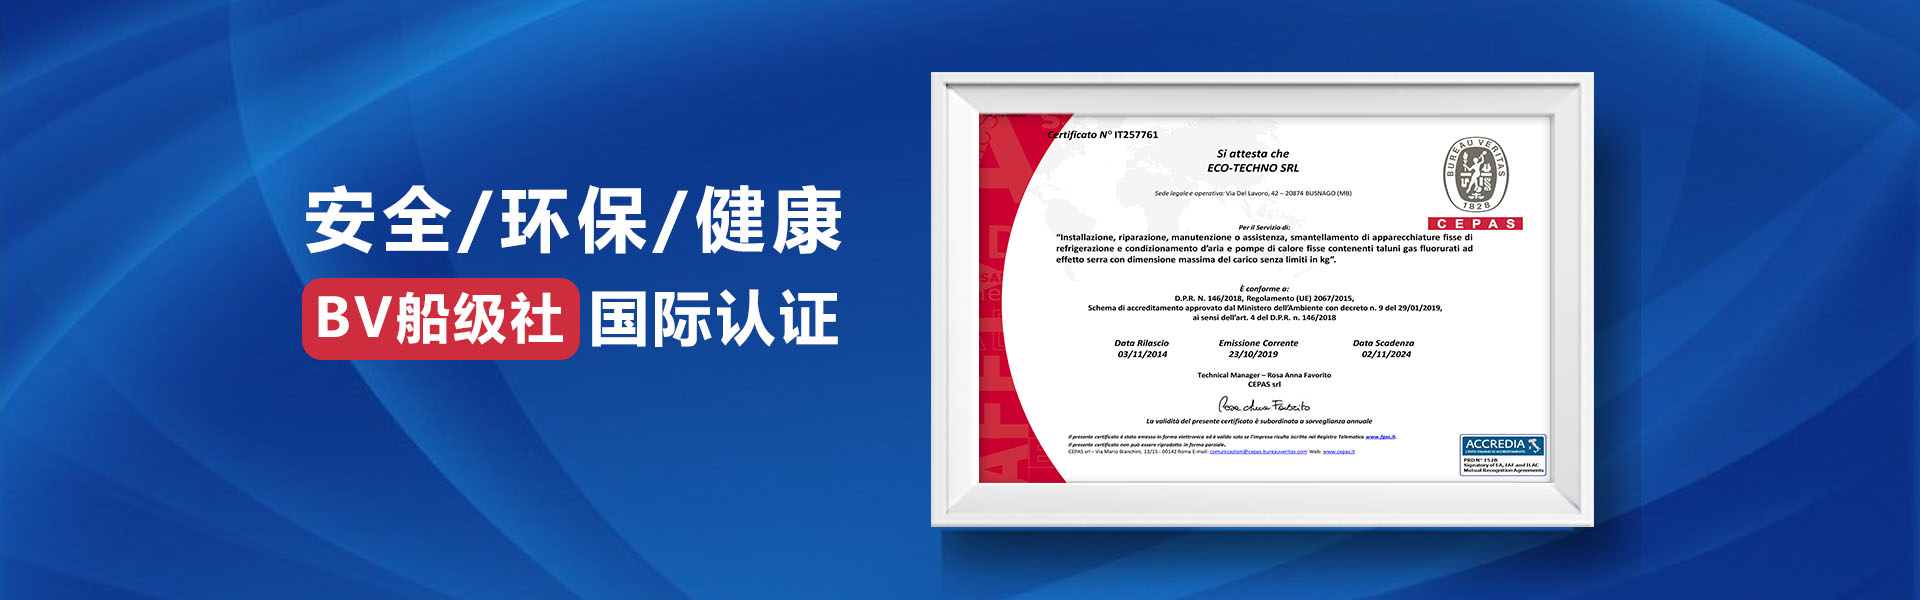 BV船级社认证